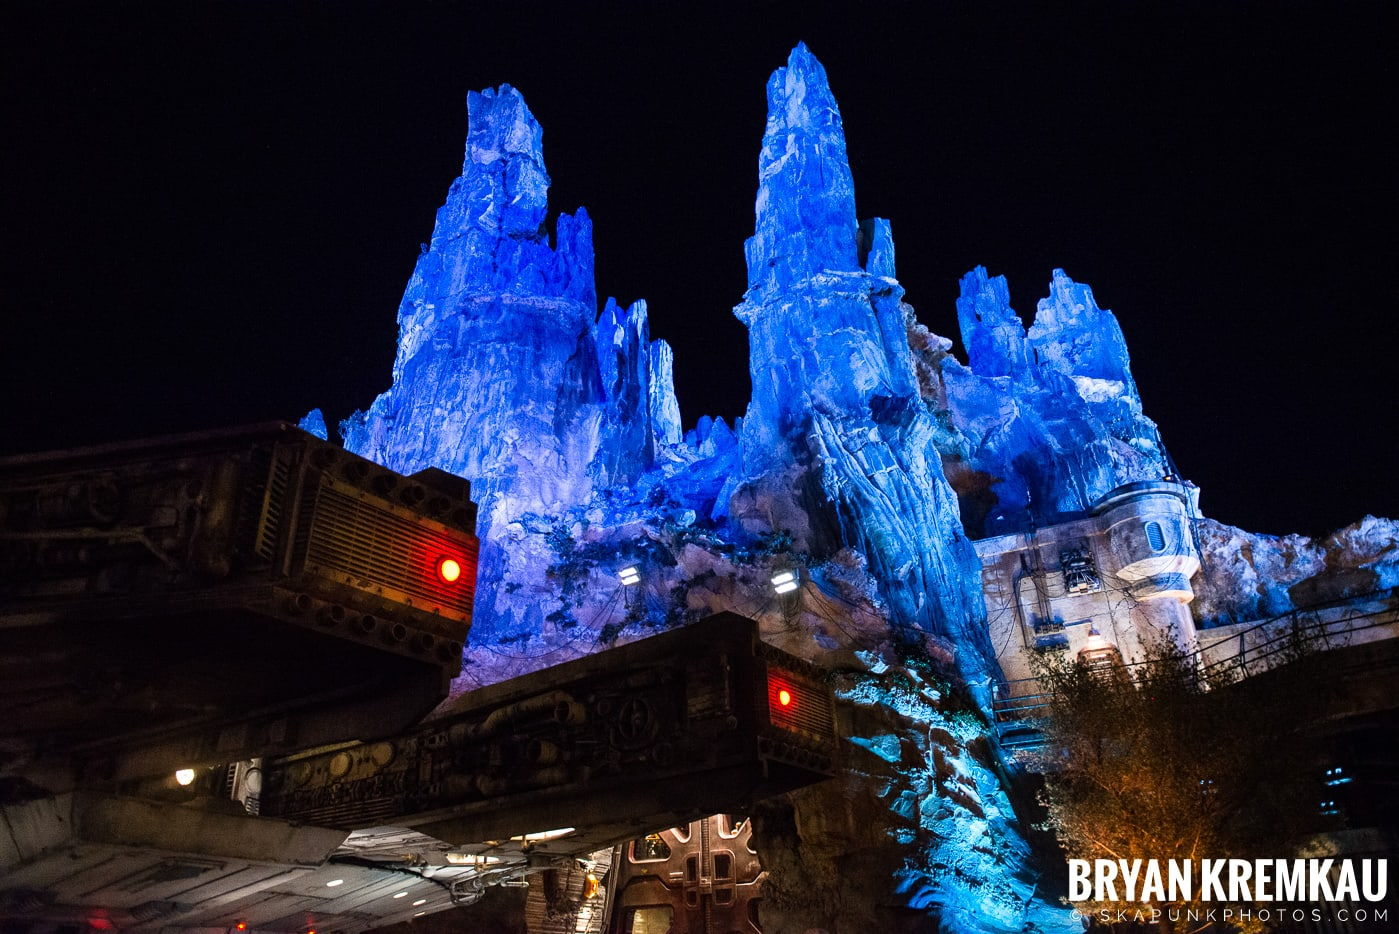 Walt Disney World Vacation: Day 5 (Animal Kingdom / Disney's Hollywood Studios) - 10.3.19 (16)